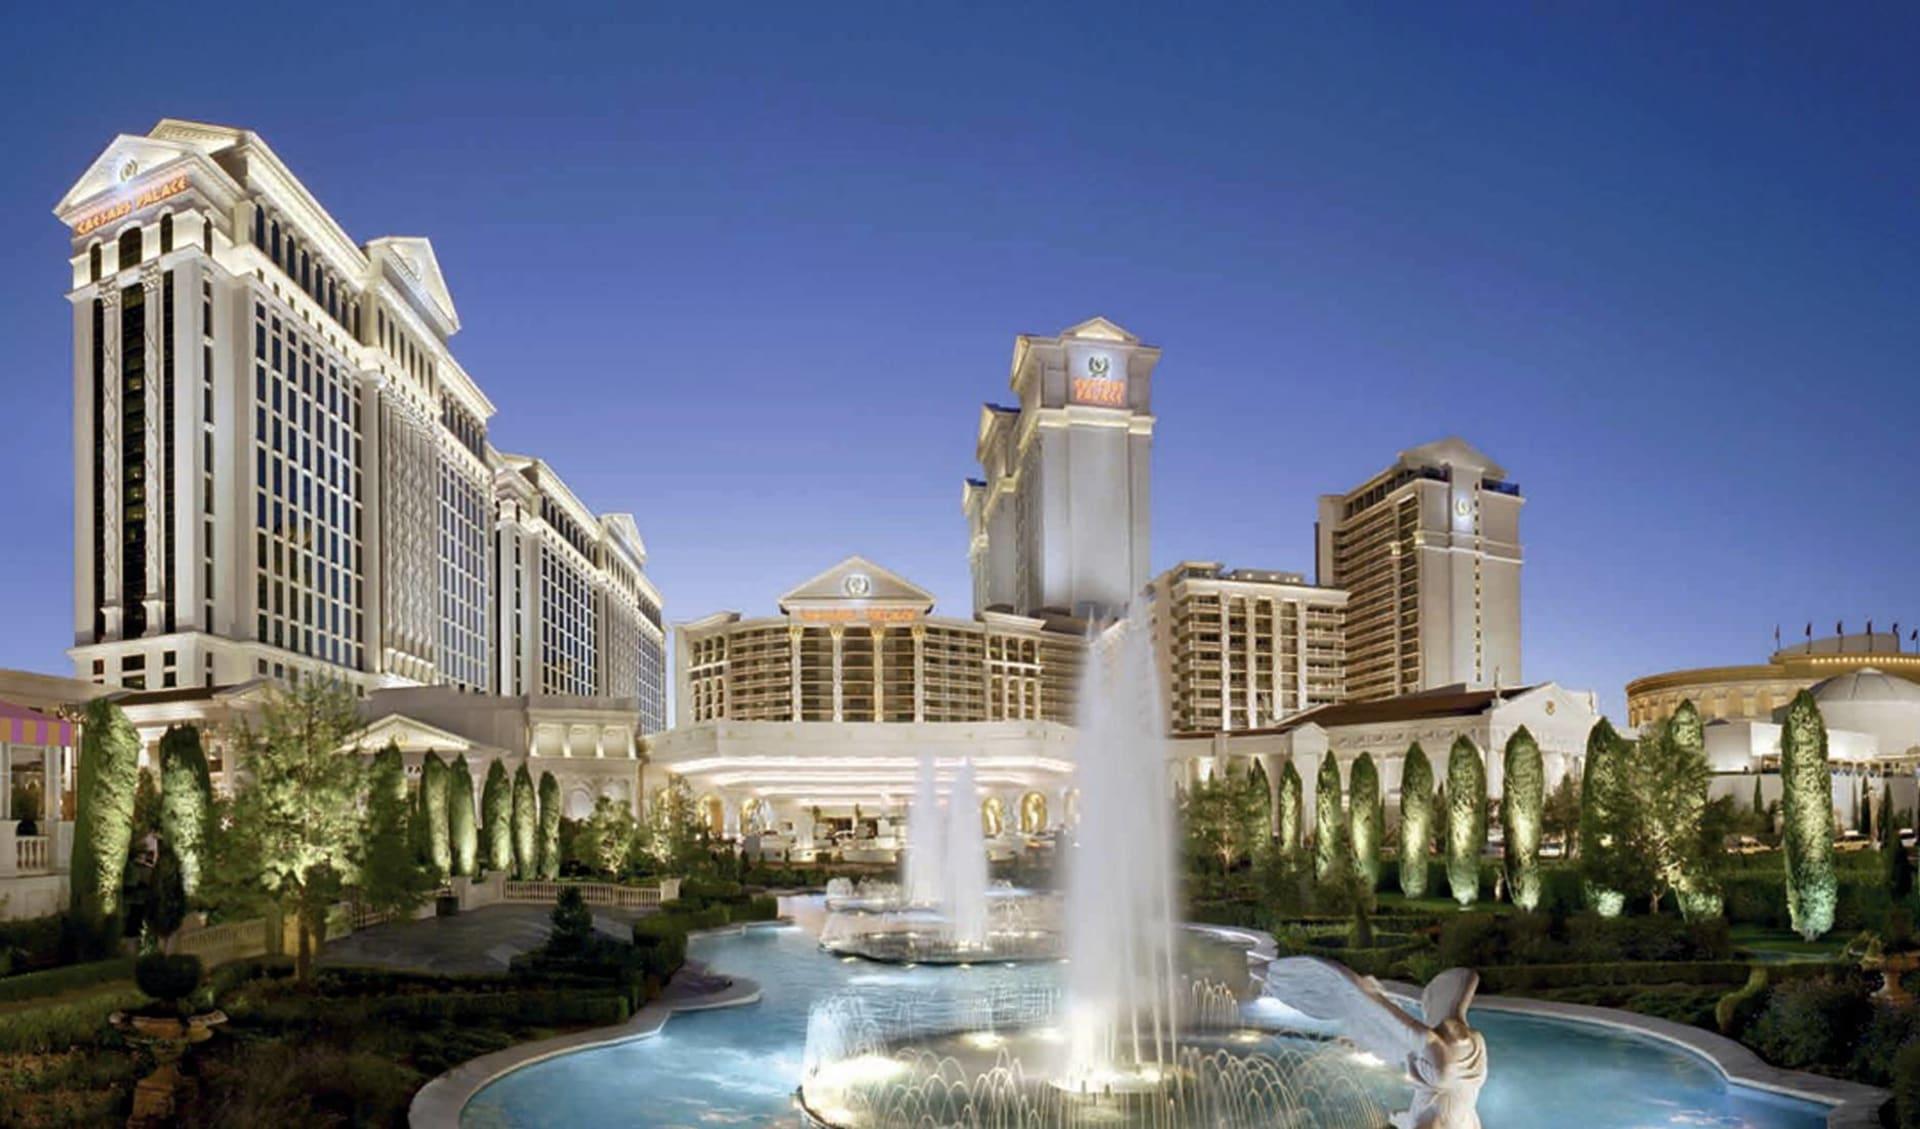 Caesars Palace in Las Vegas: exterior premium mietwagenrundreise california dreamin deluxe caesars palace hotelansicht